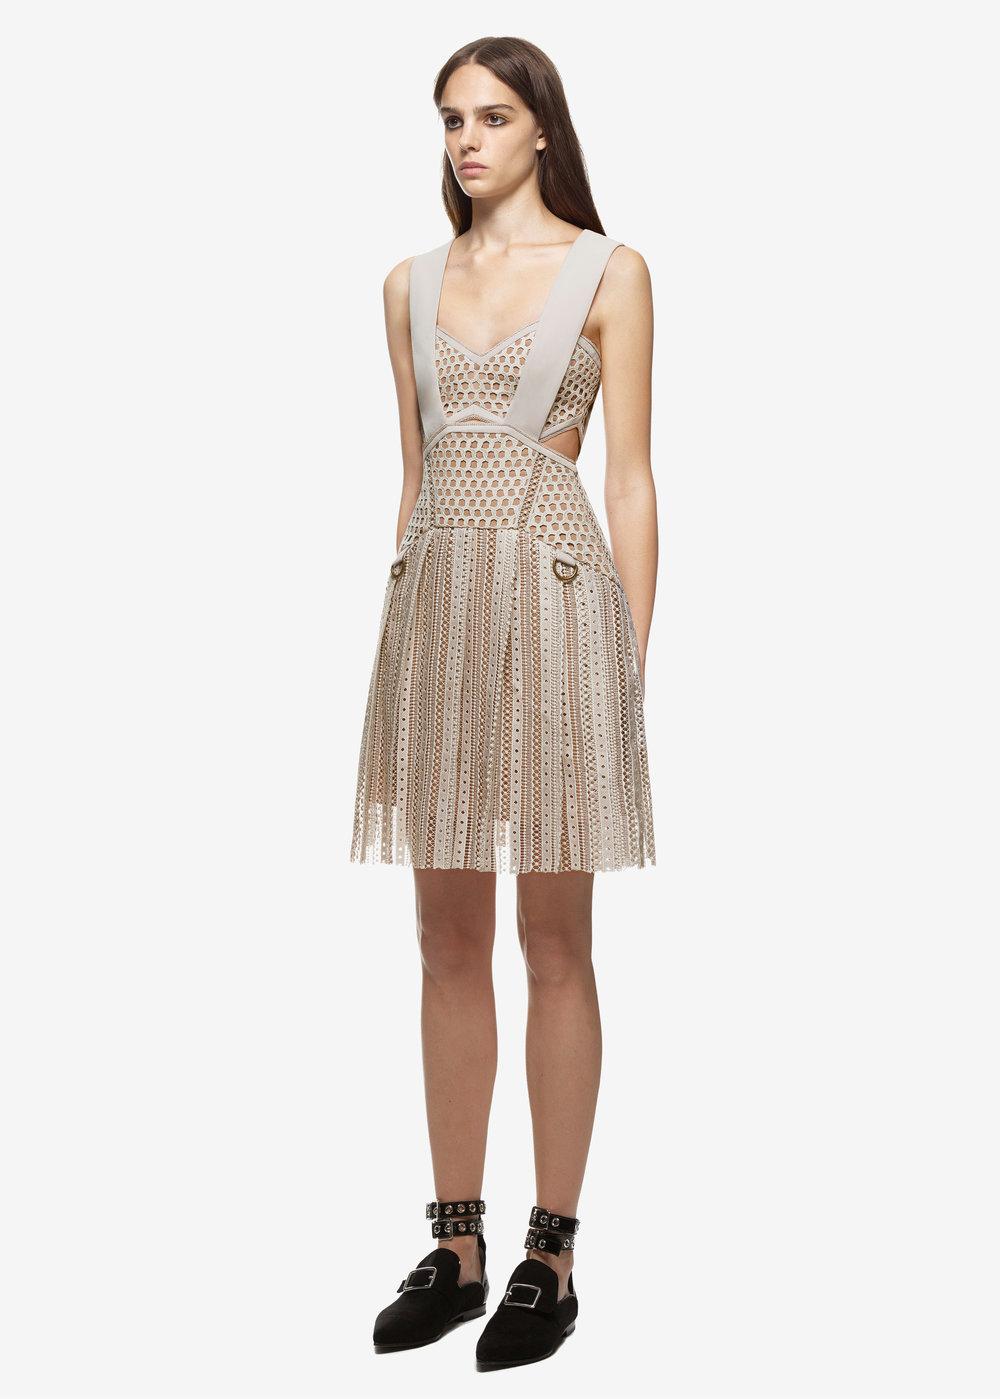 Avery Mini Dress $498